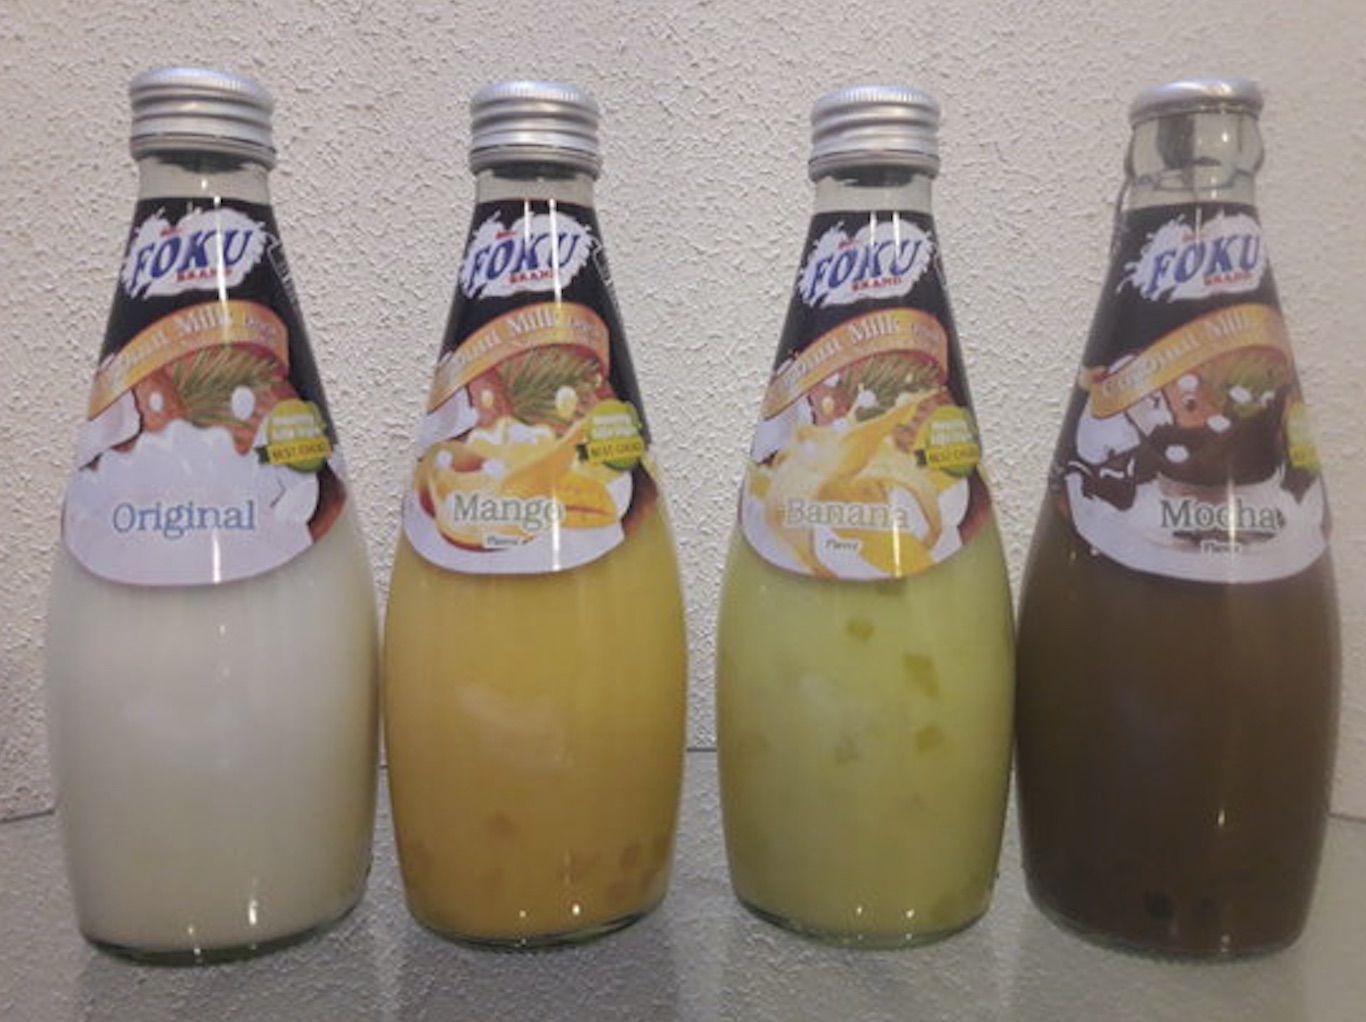 Flavored milk-based drinks